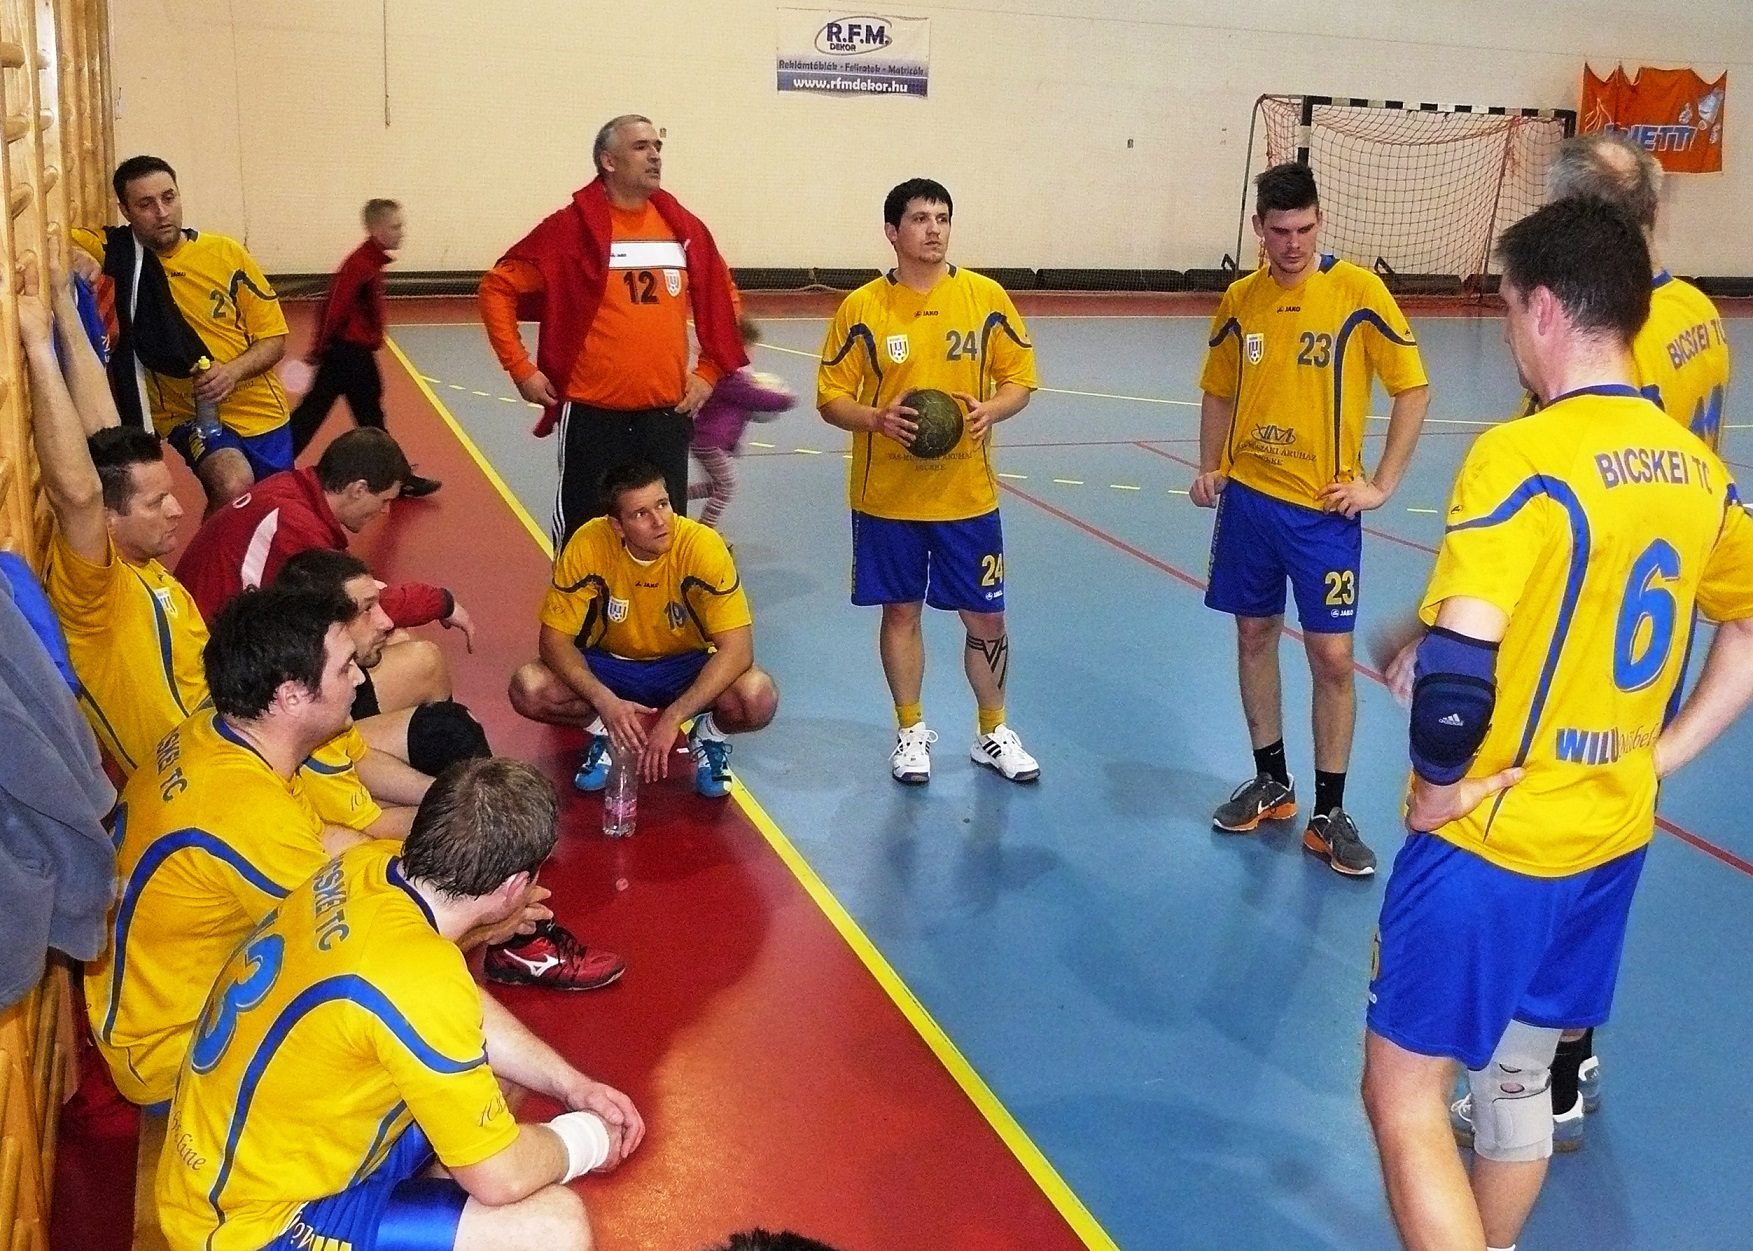 Bicske-Sárbogárd 24-21 férfi kézilabda.JPG